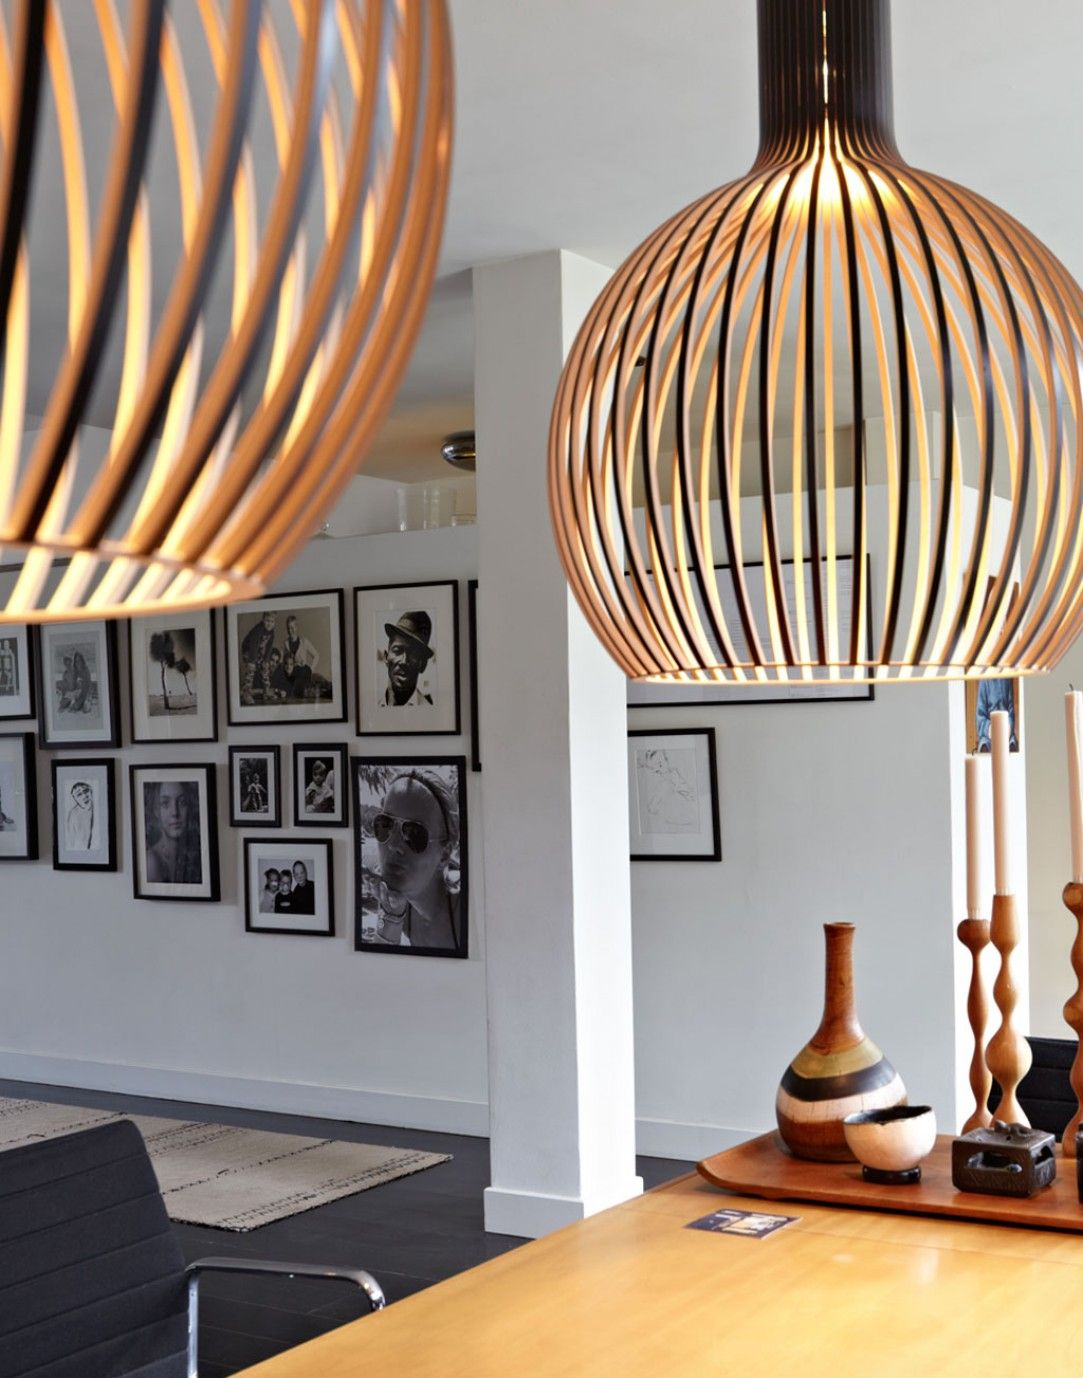 amsterdam-stadsetage-eetkamer-grote-hanglampen-zwart-witte ...